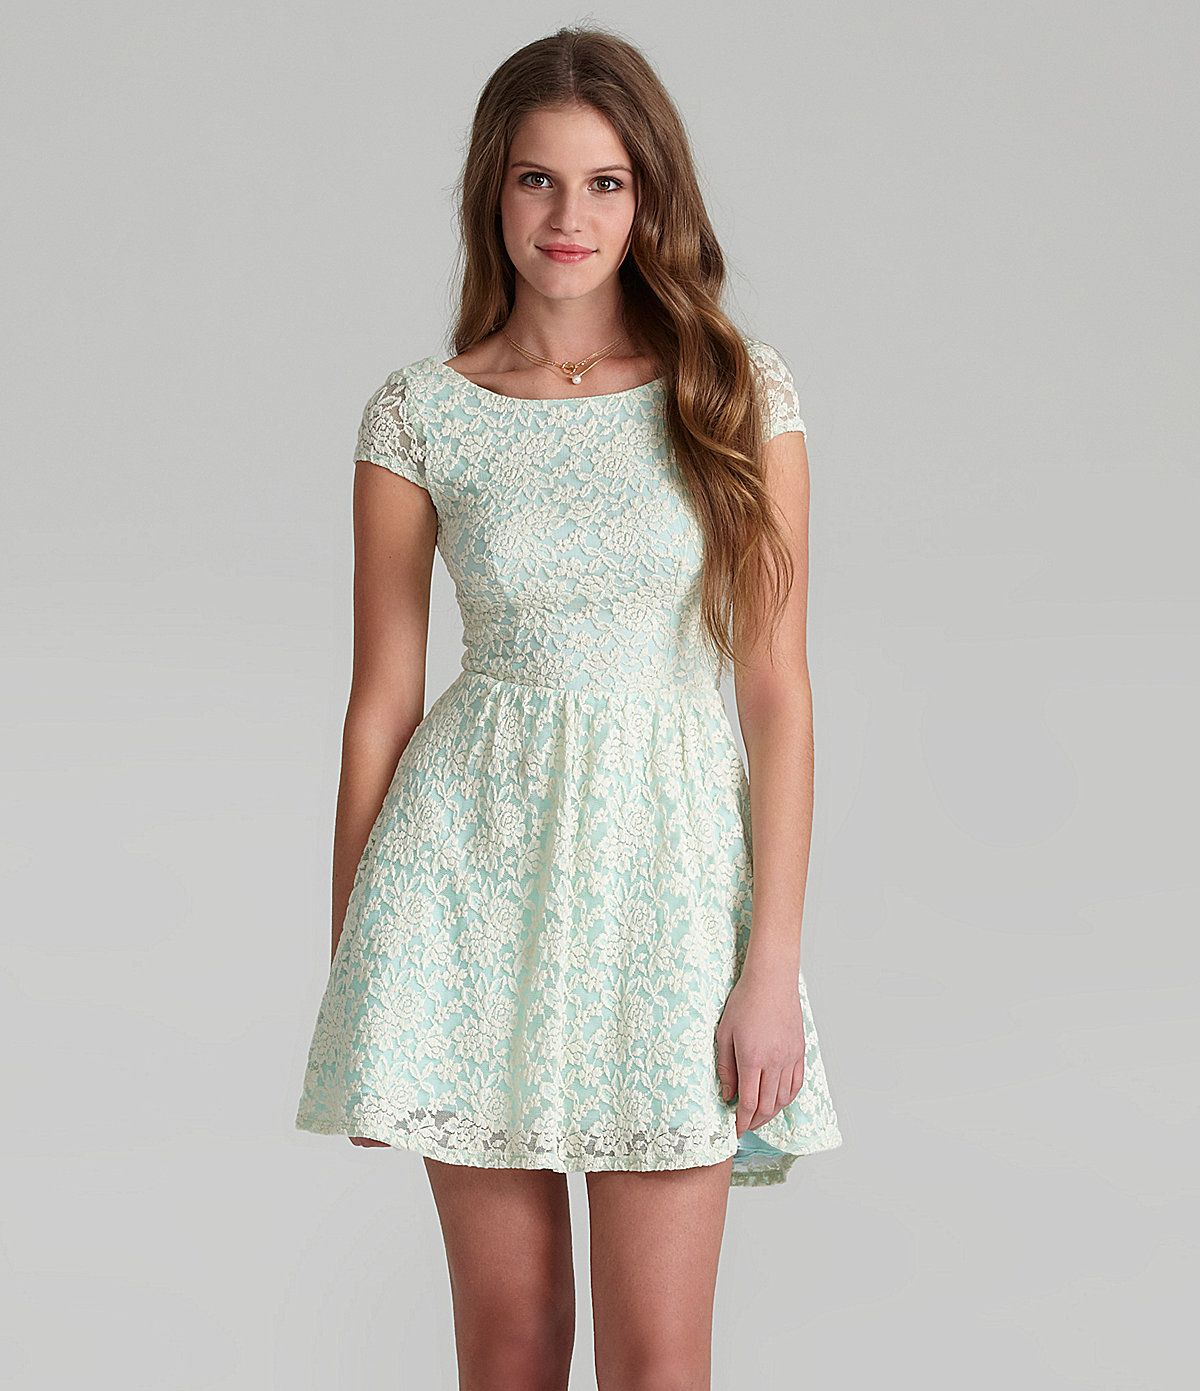 B Darlin Cap Sleeve Lace Skater Dress Dillards Com Lace Skater Dress Derby Attire Dresses [ 1391 x 1200 Pixel ]